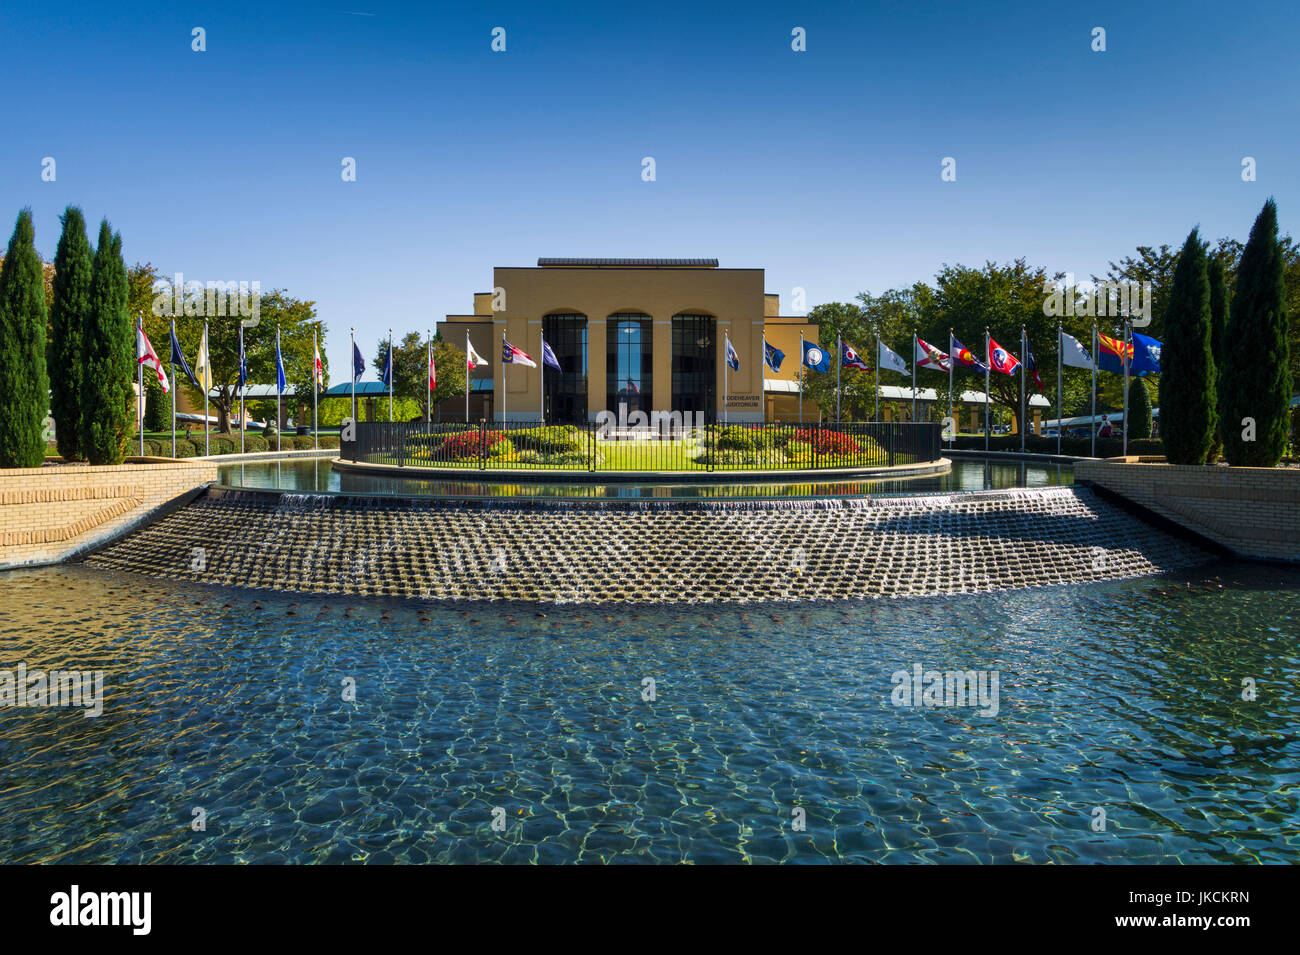 USA, South Carolina, Greenville, Bob Jones University, Rodeheaver Auditorium from the Fountain Bridge Stock Photo